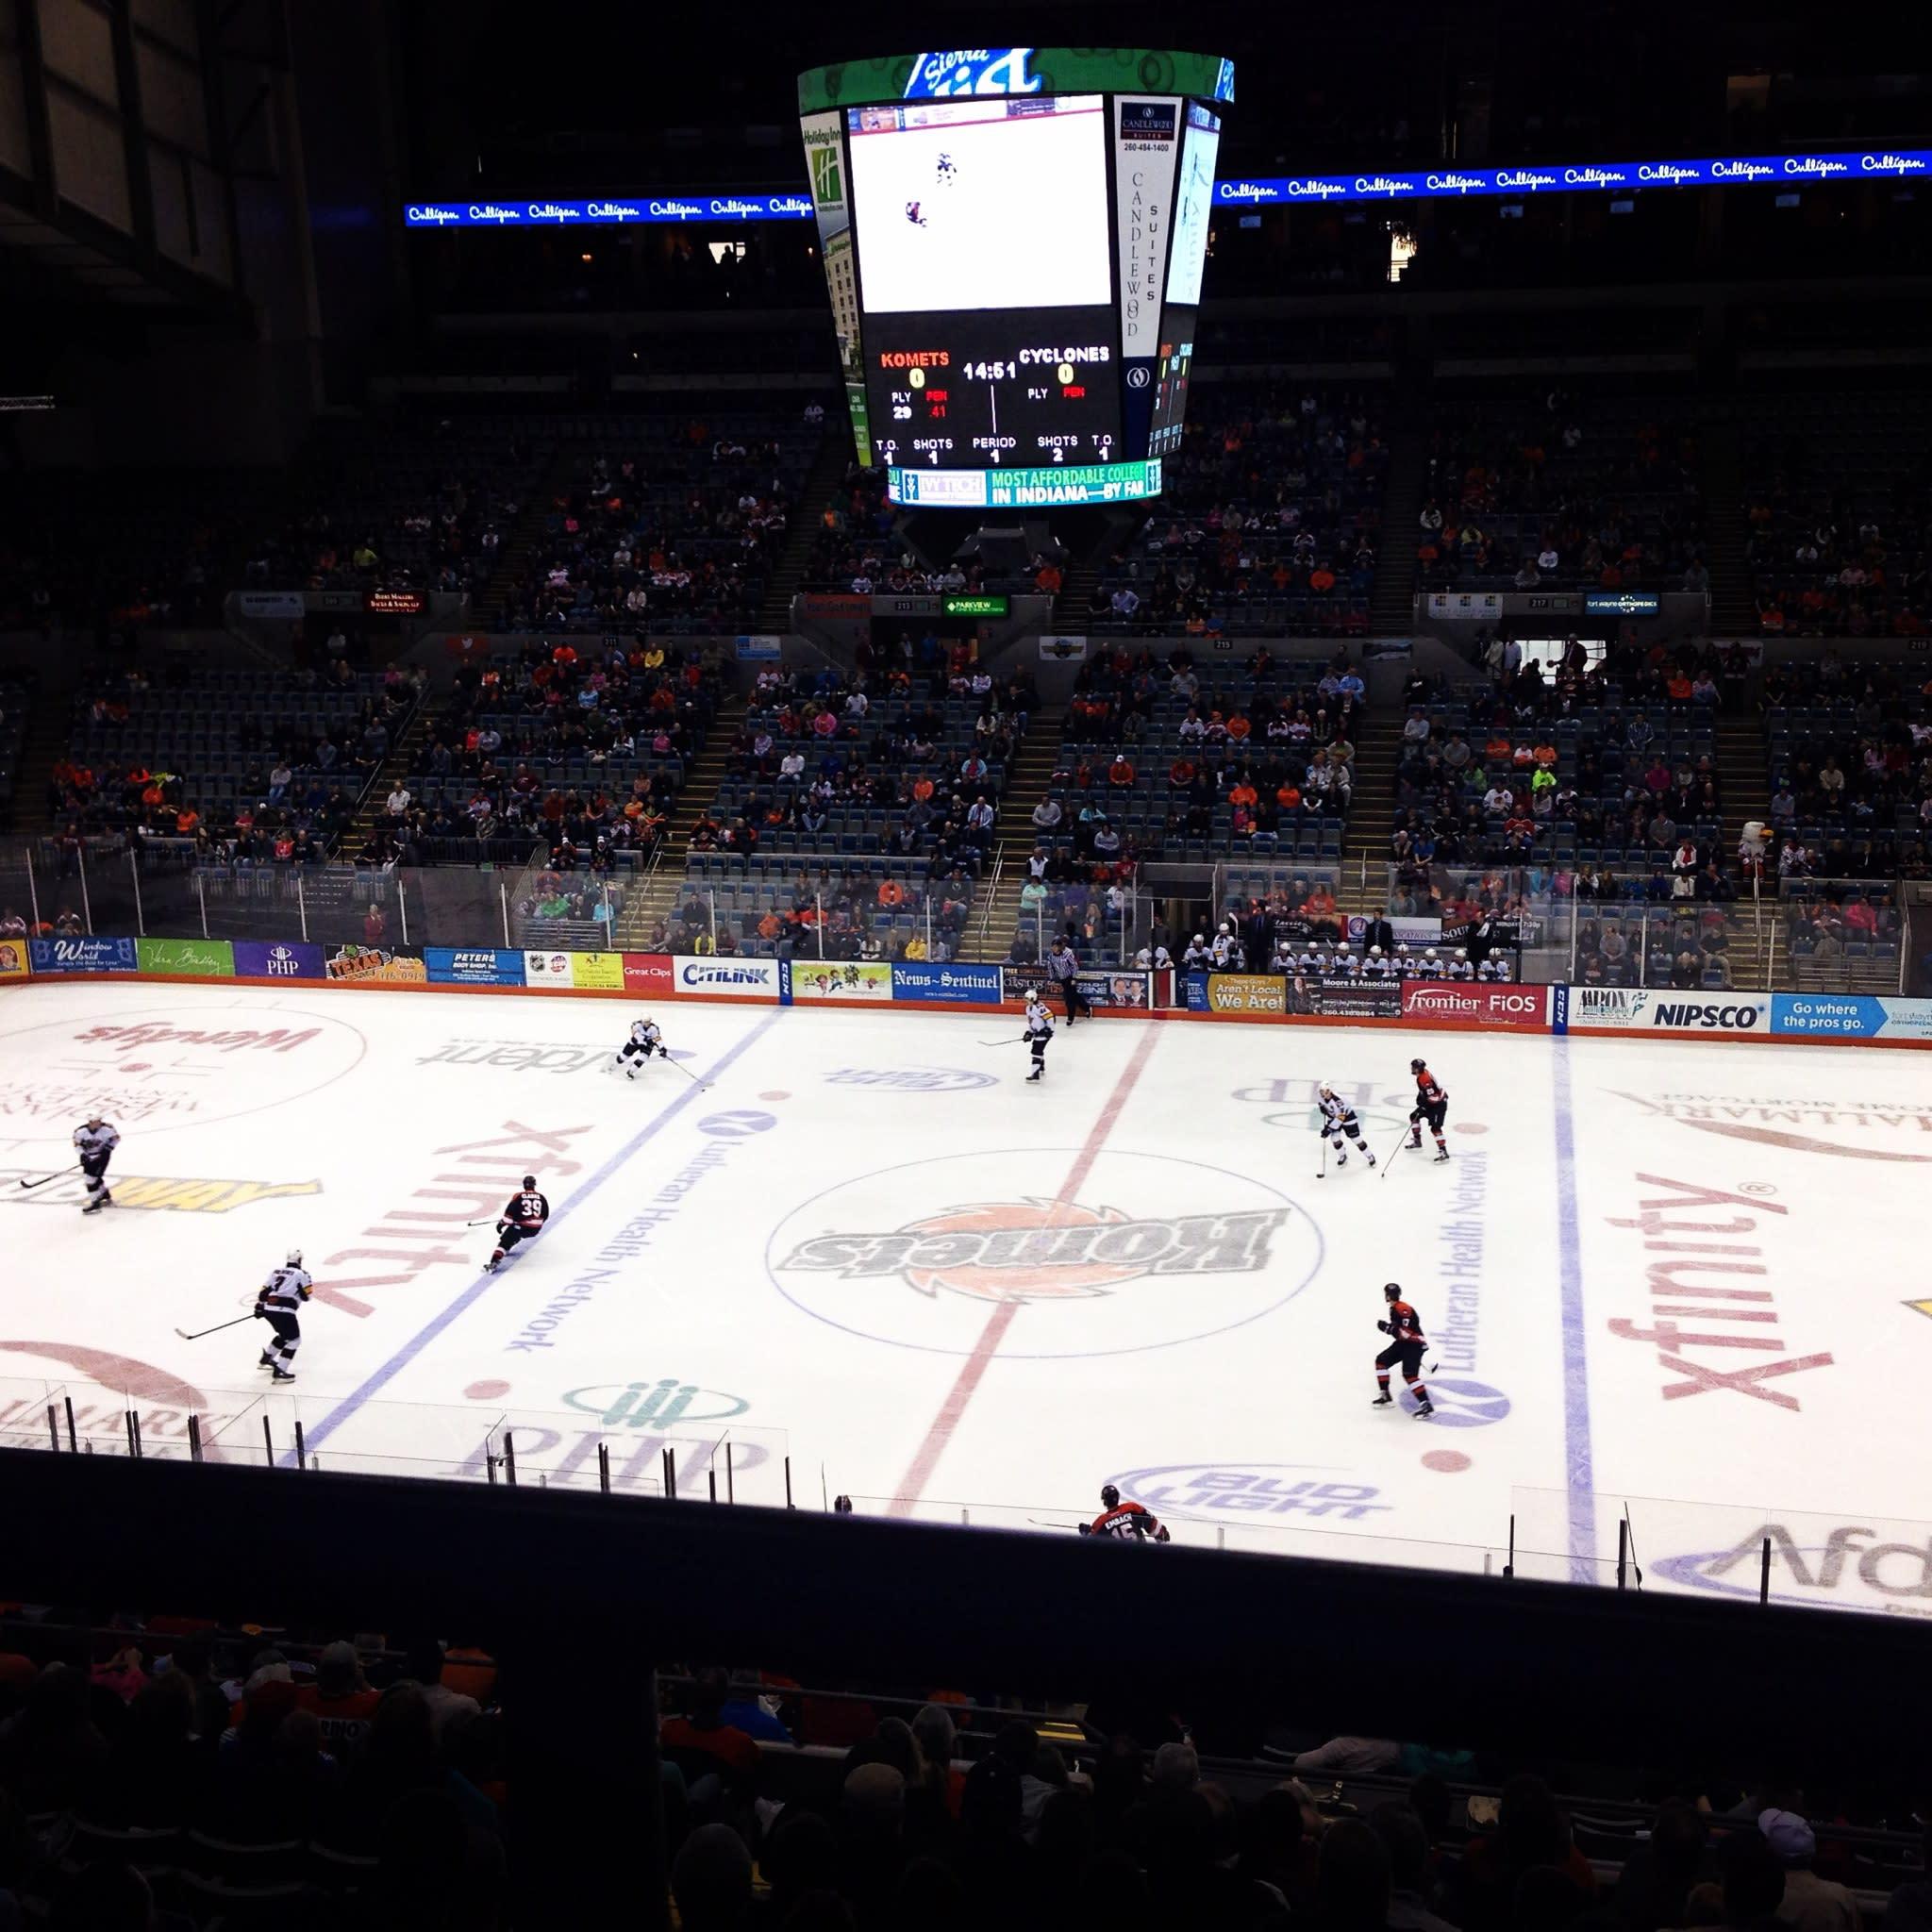 Cheer on the Fort Wayne Kometsa at the Allen County War Memorial Coliseum!